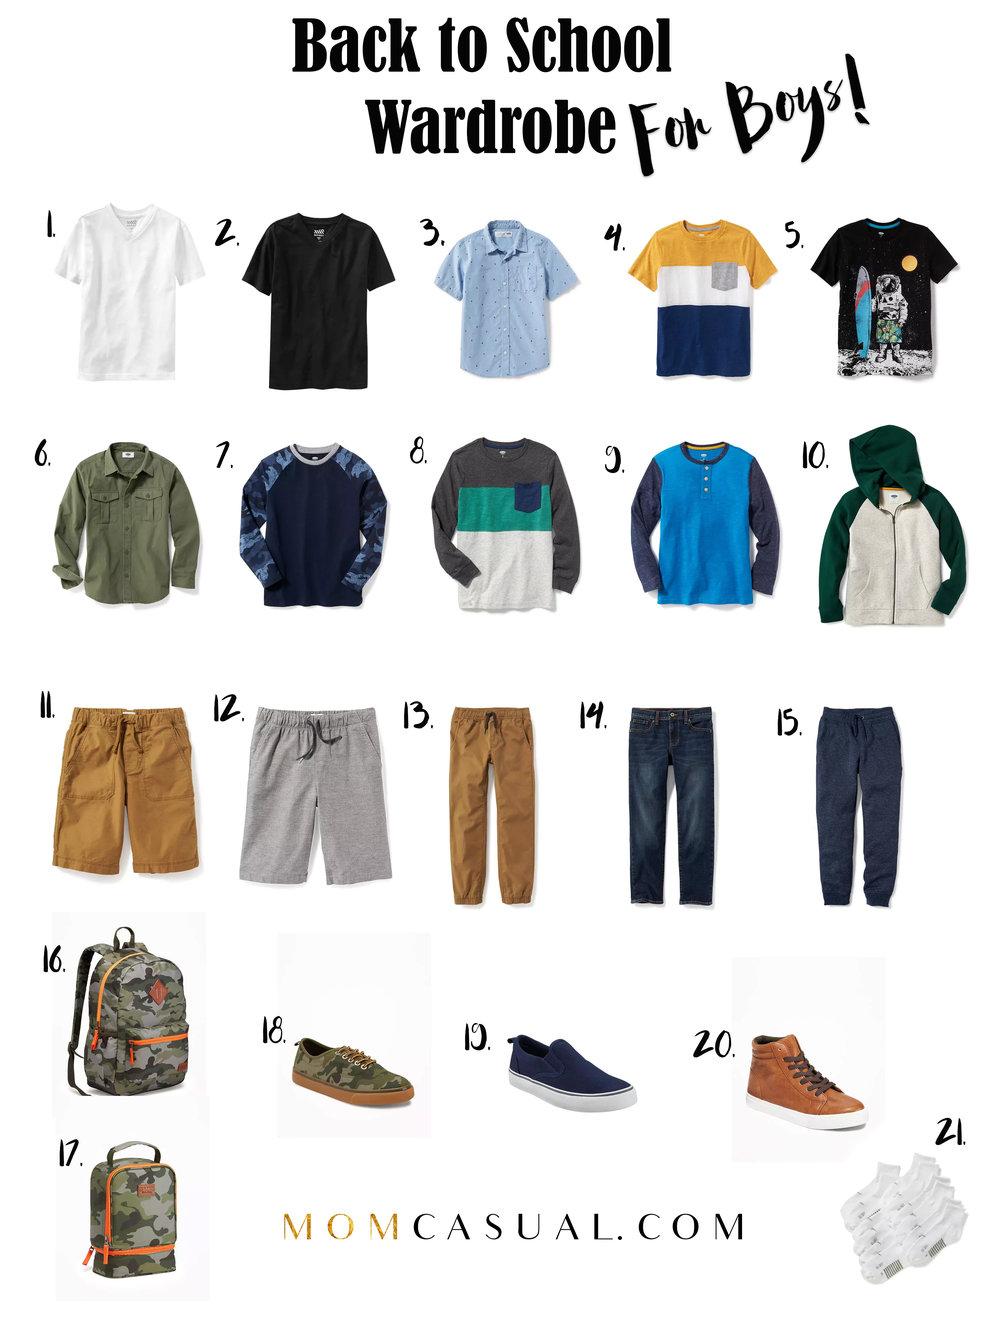 Back-to-school-wardrobe-for-boys.jpg